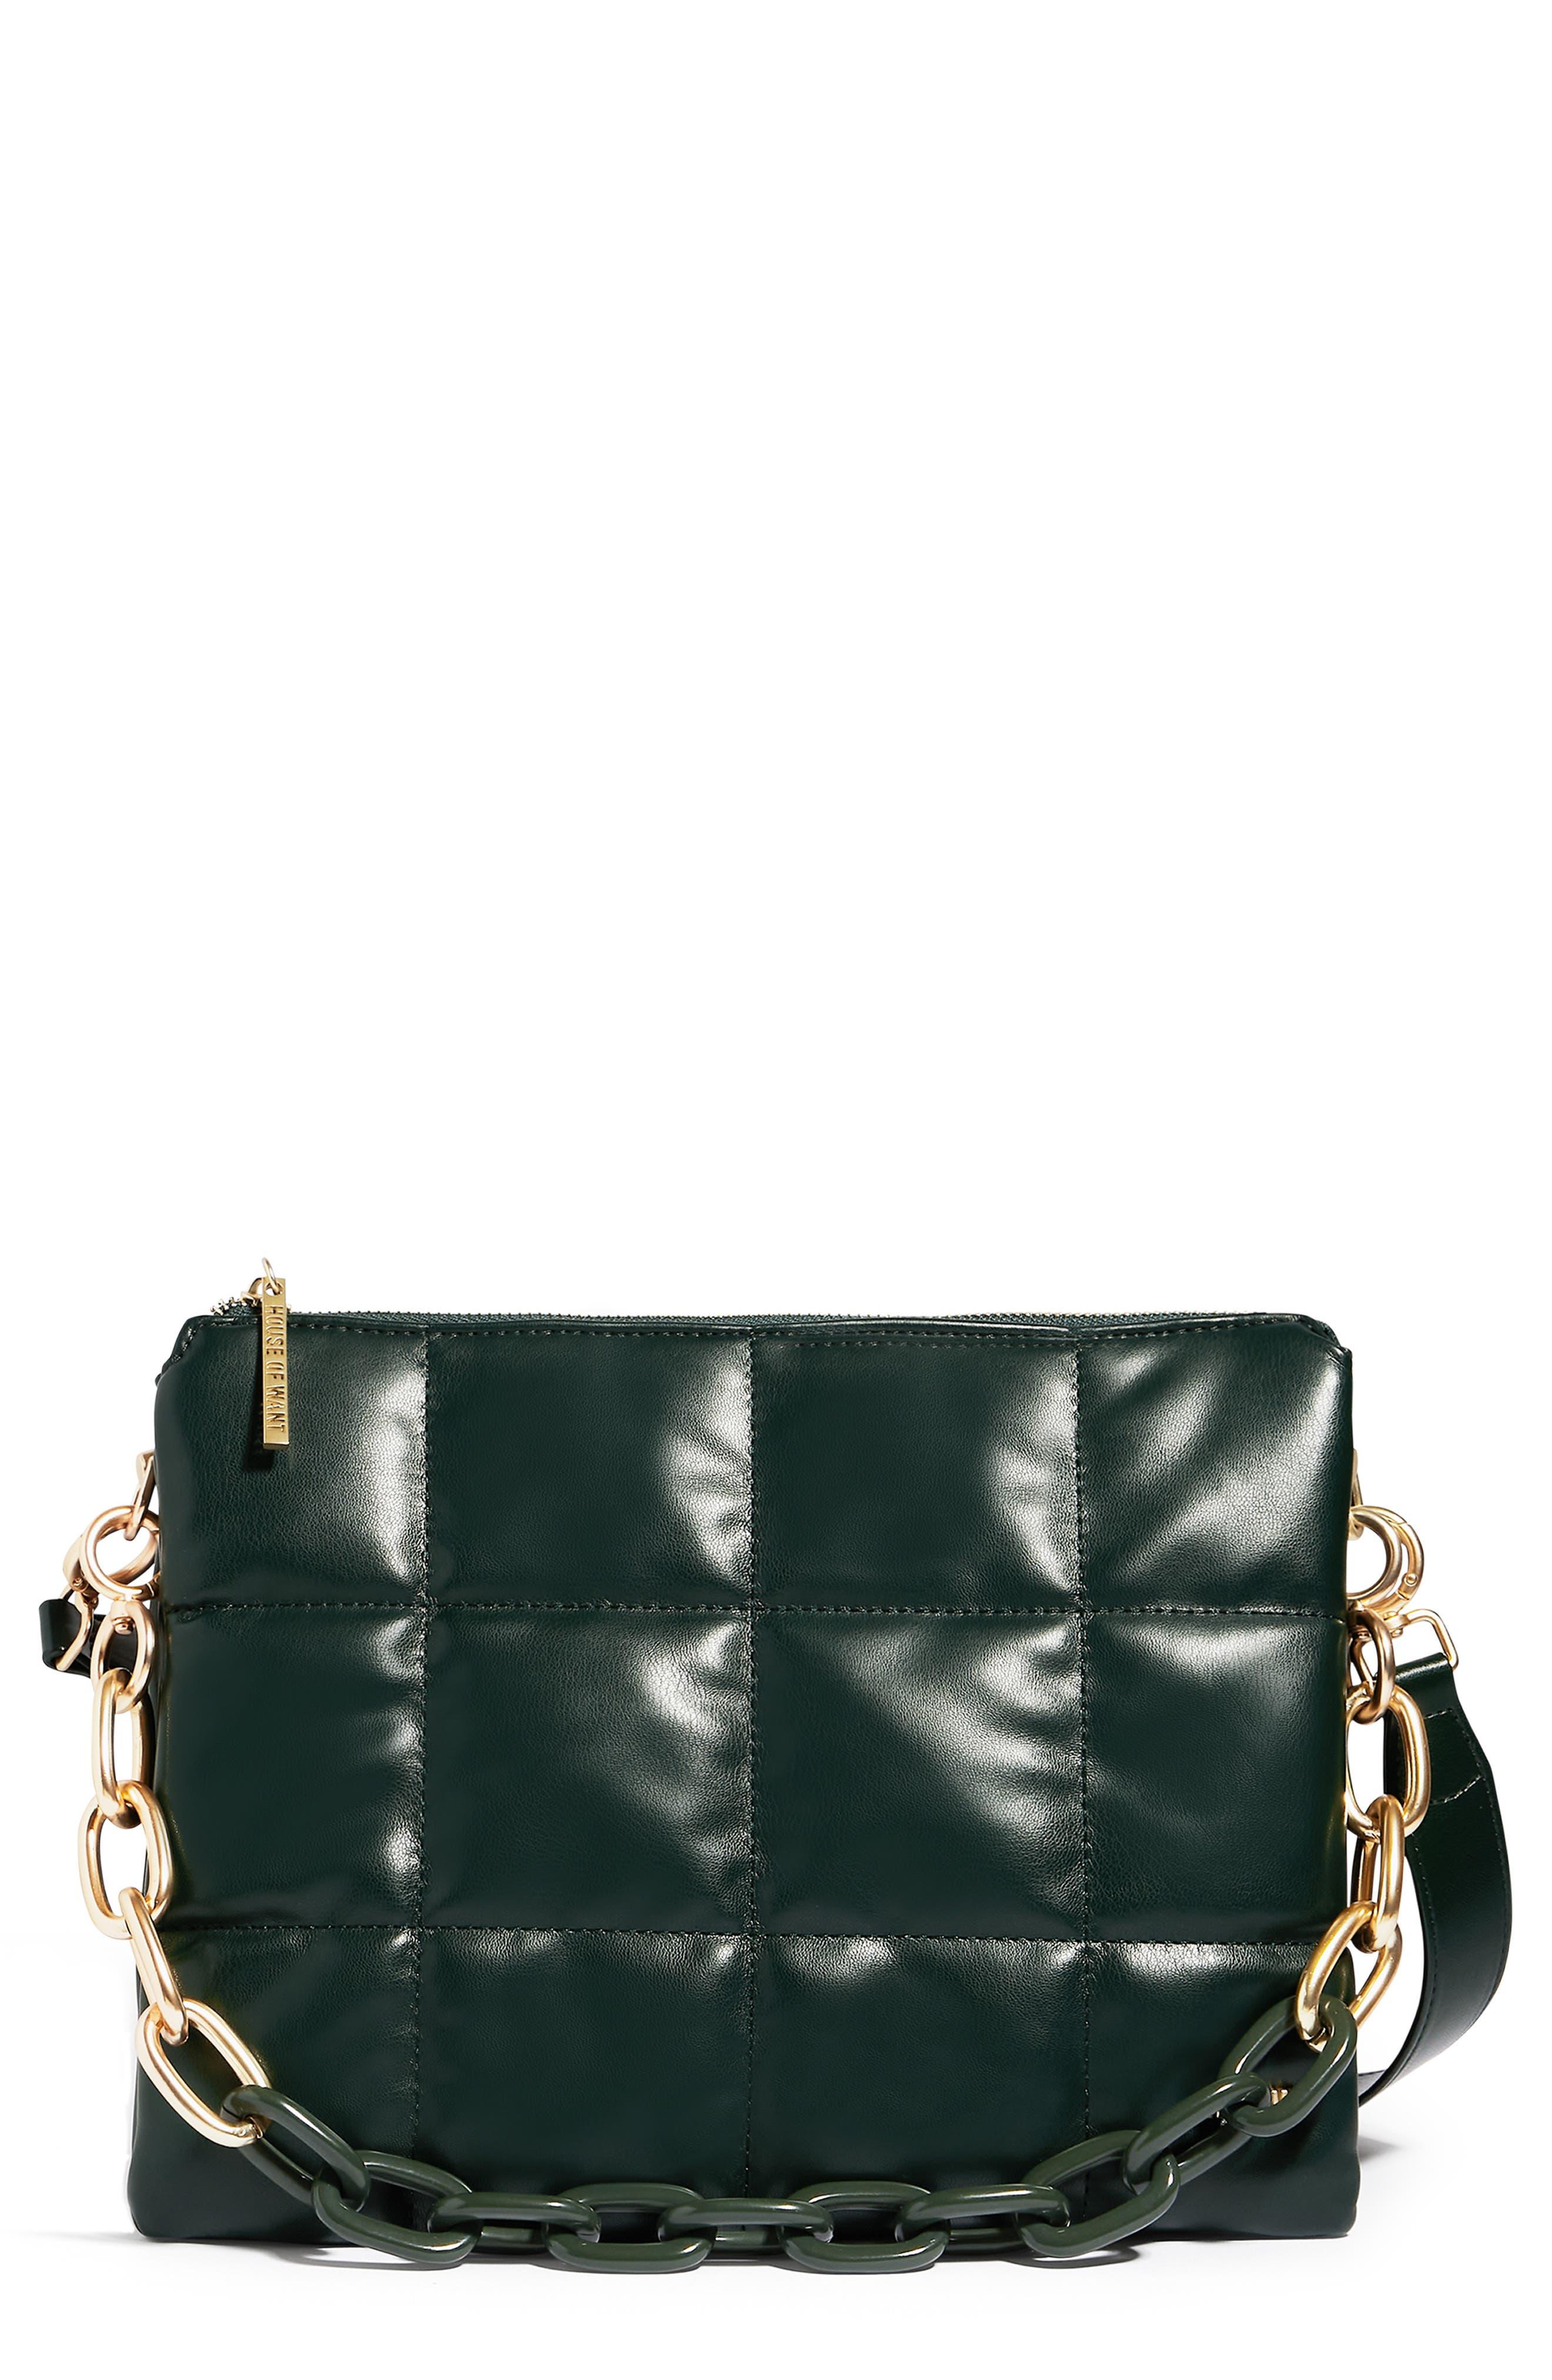 H.o.w. We Class-Ify Vegan Leather Shoulder Bag